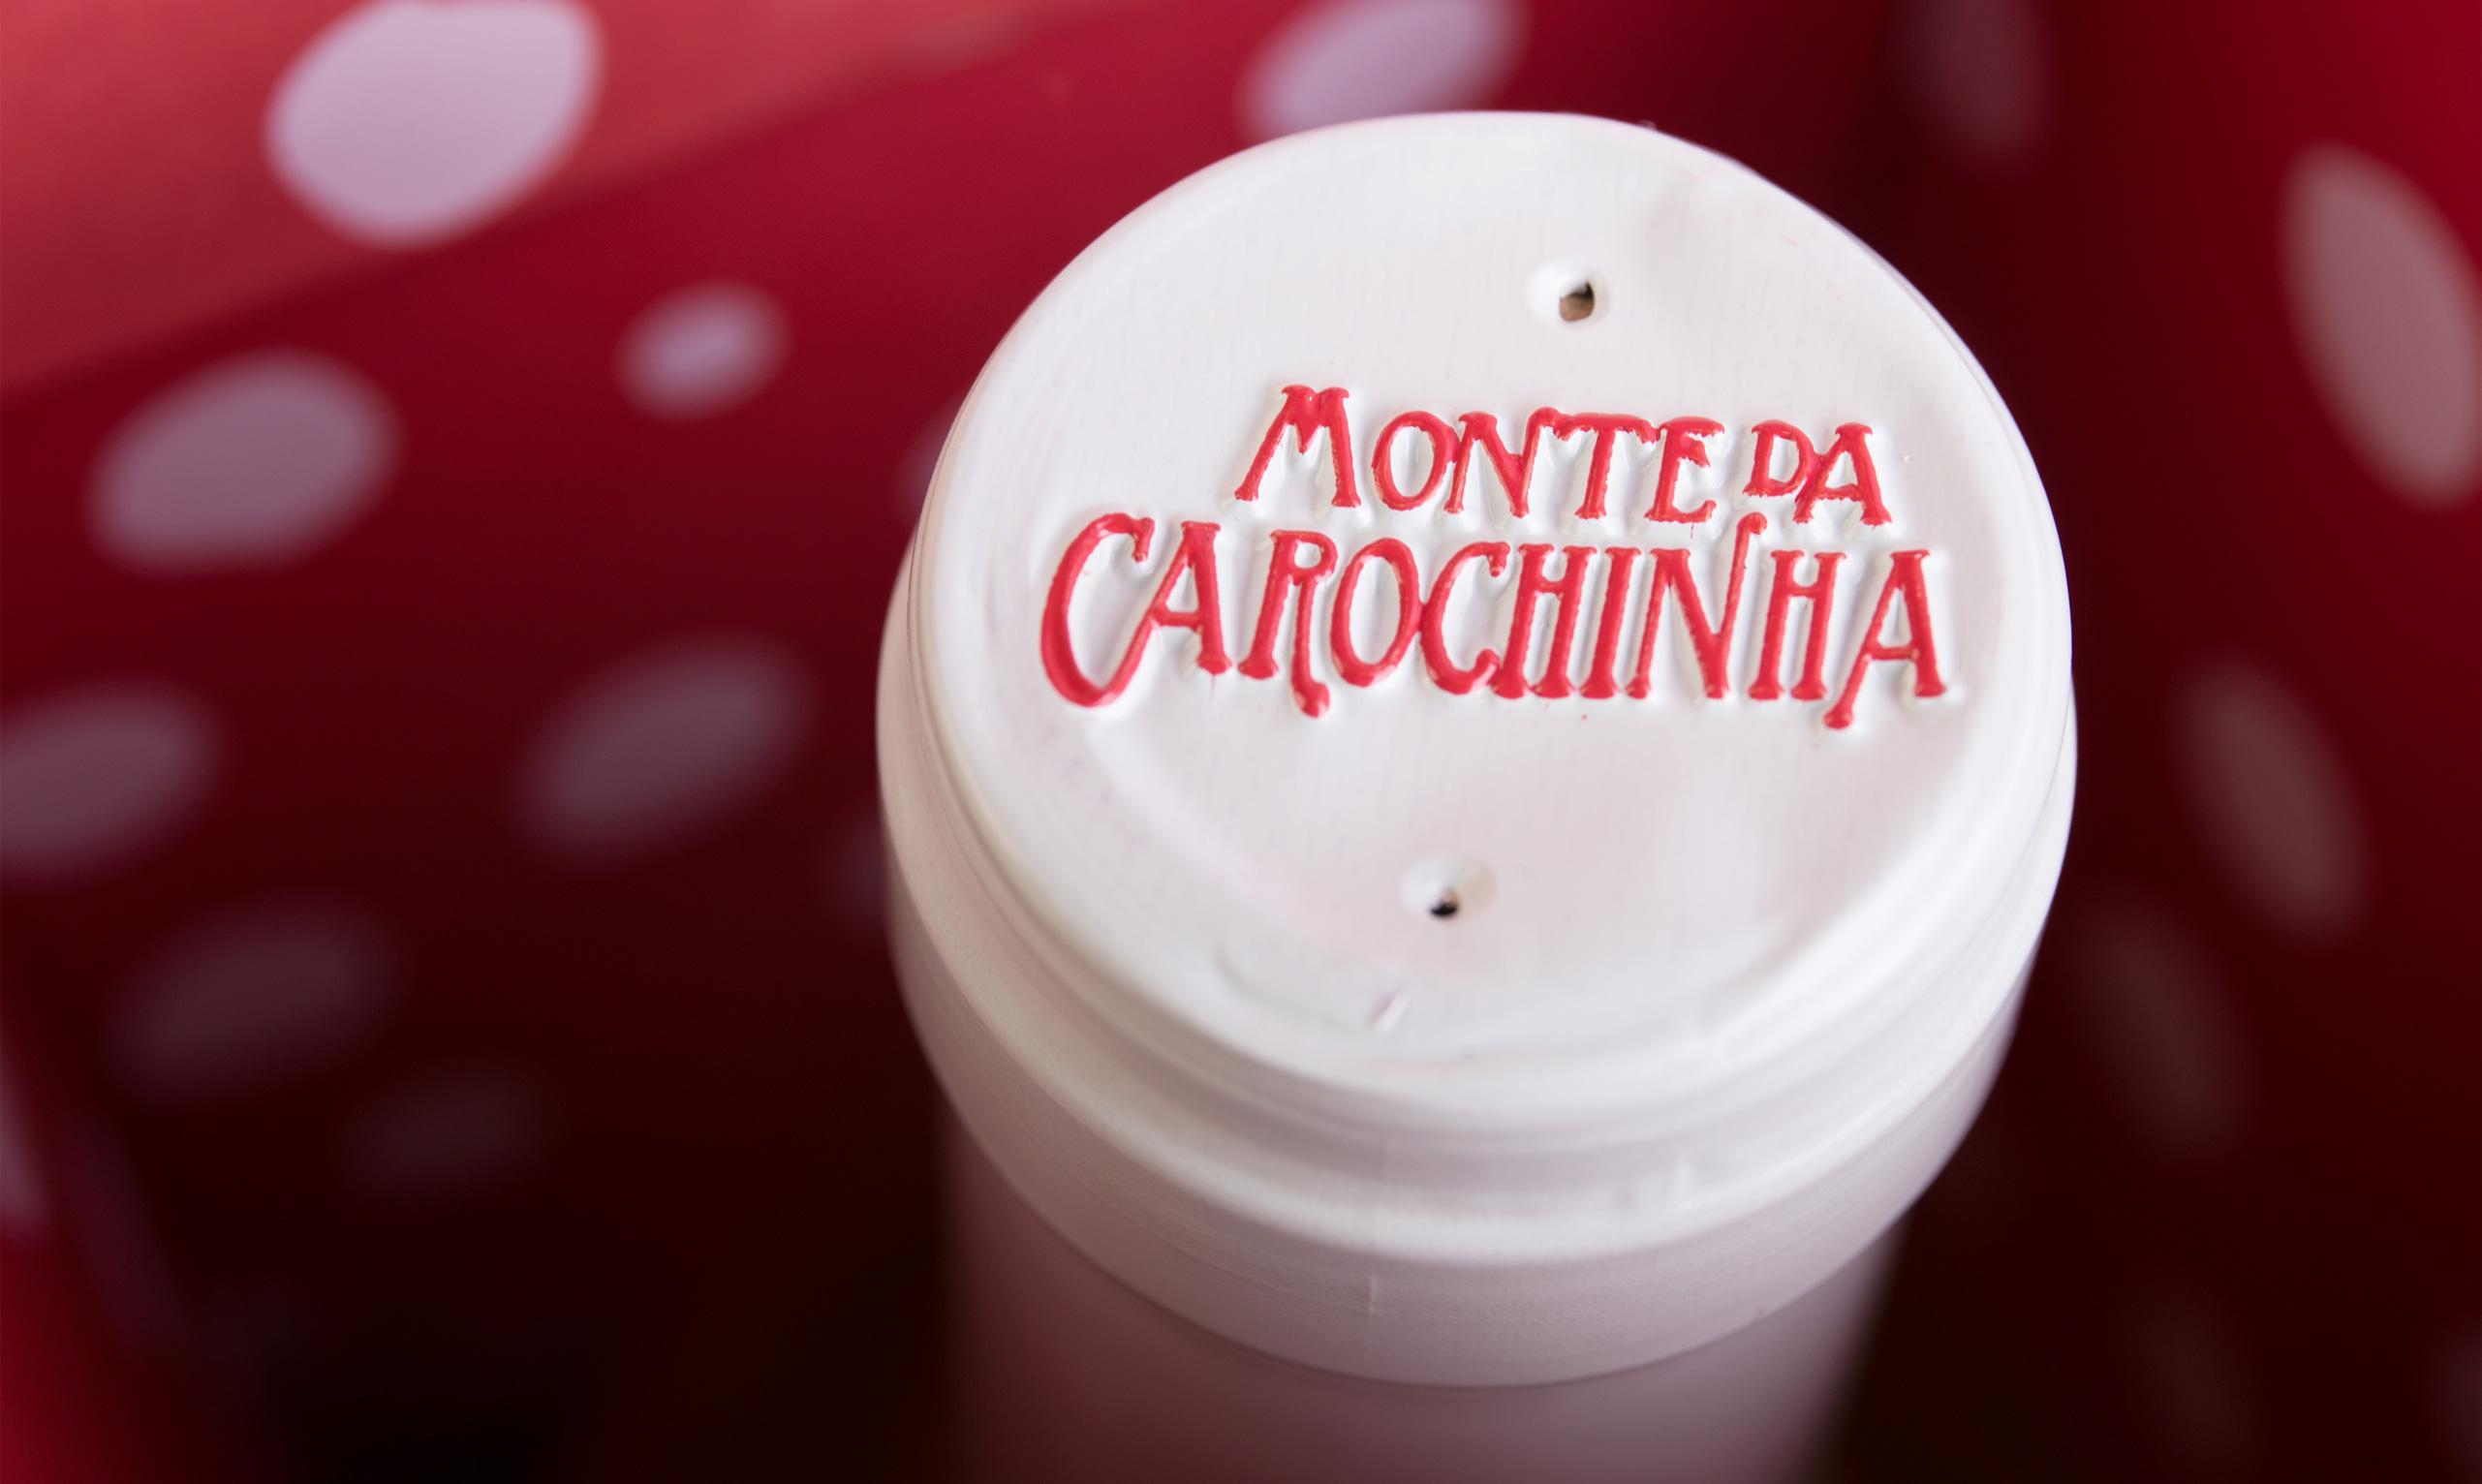 carochinha-4_p